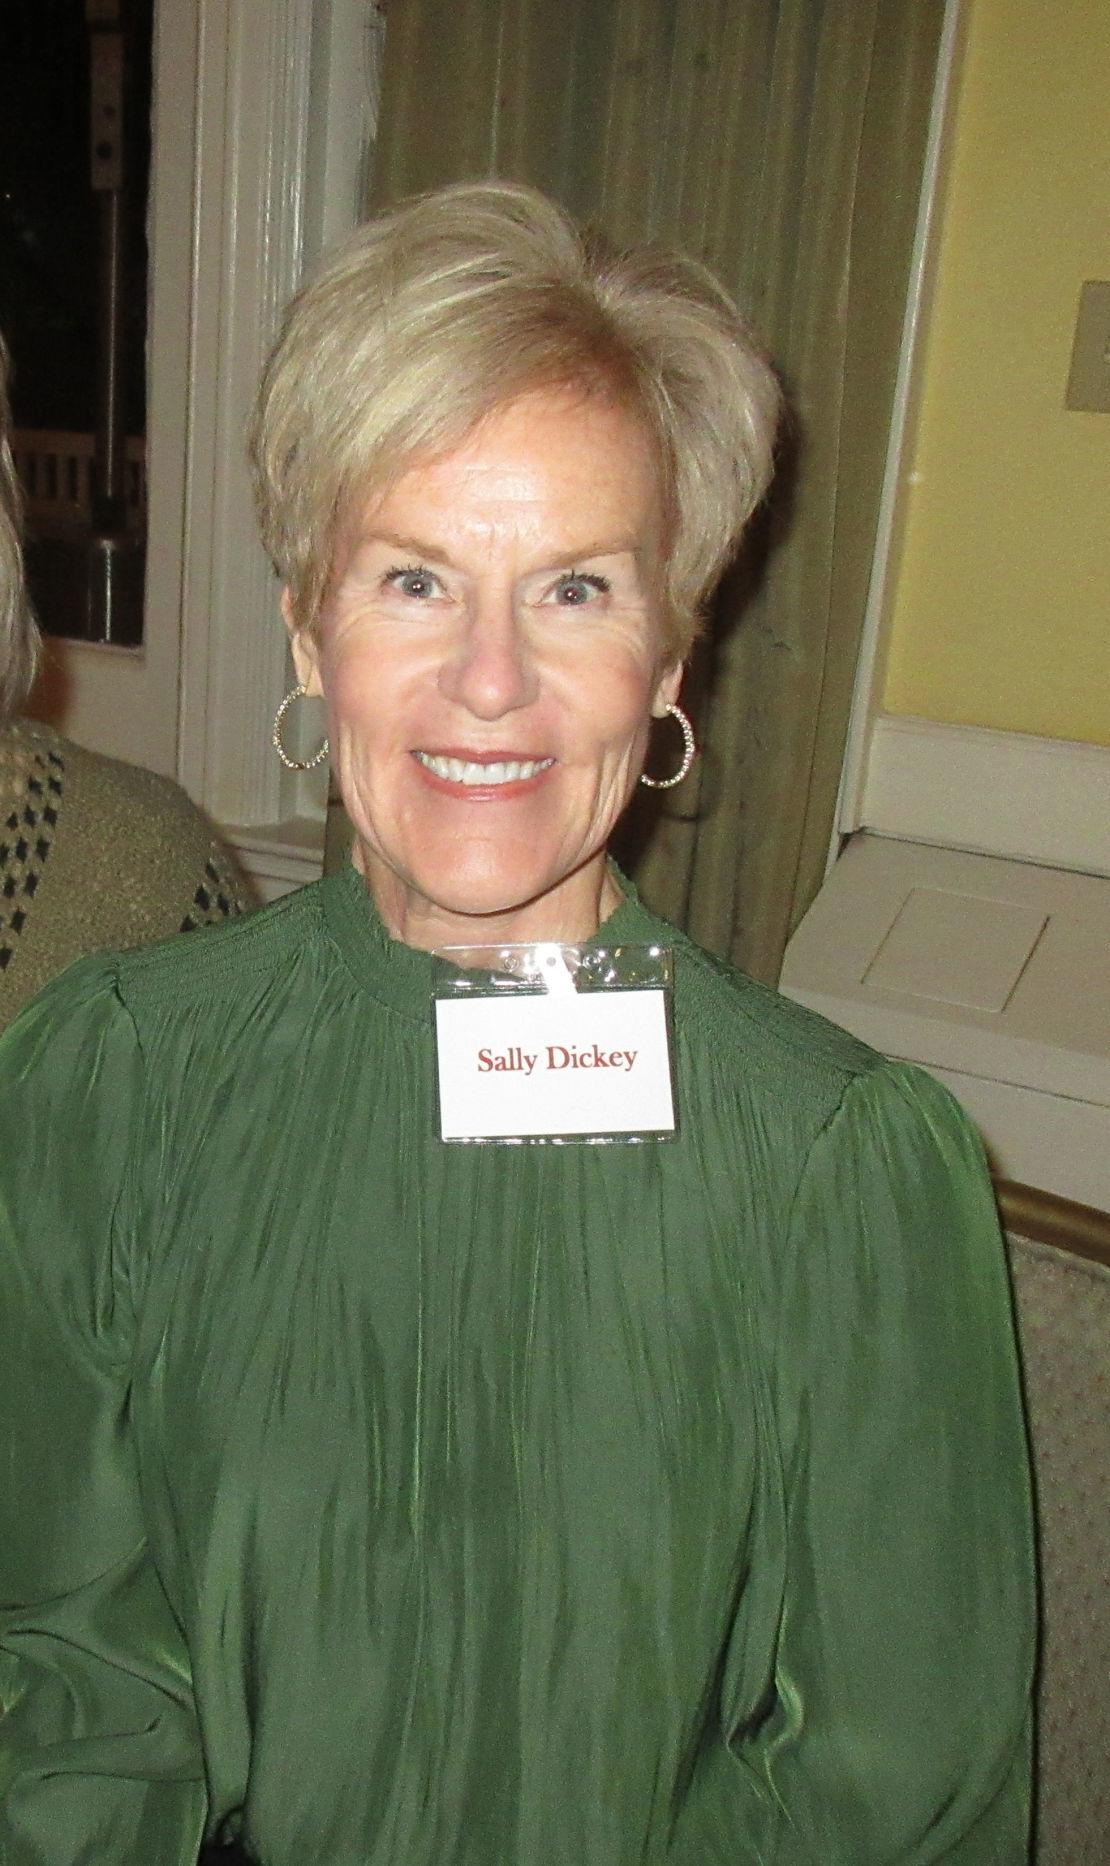 Sally Dickey